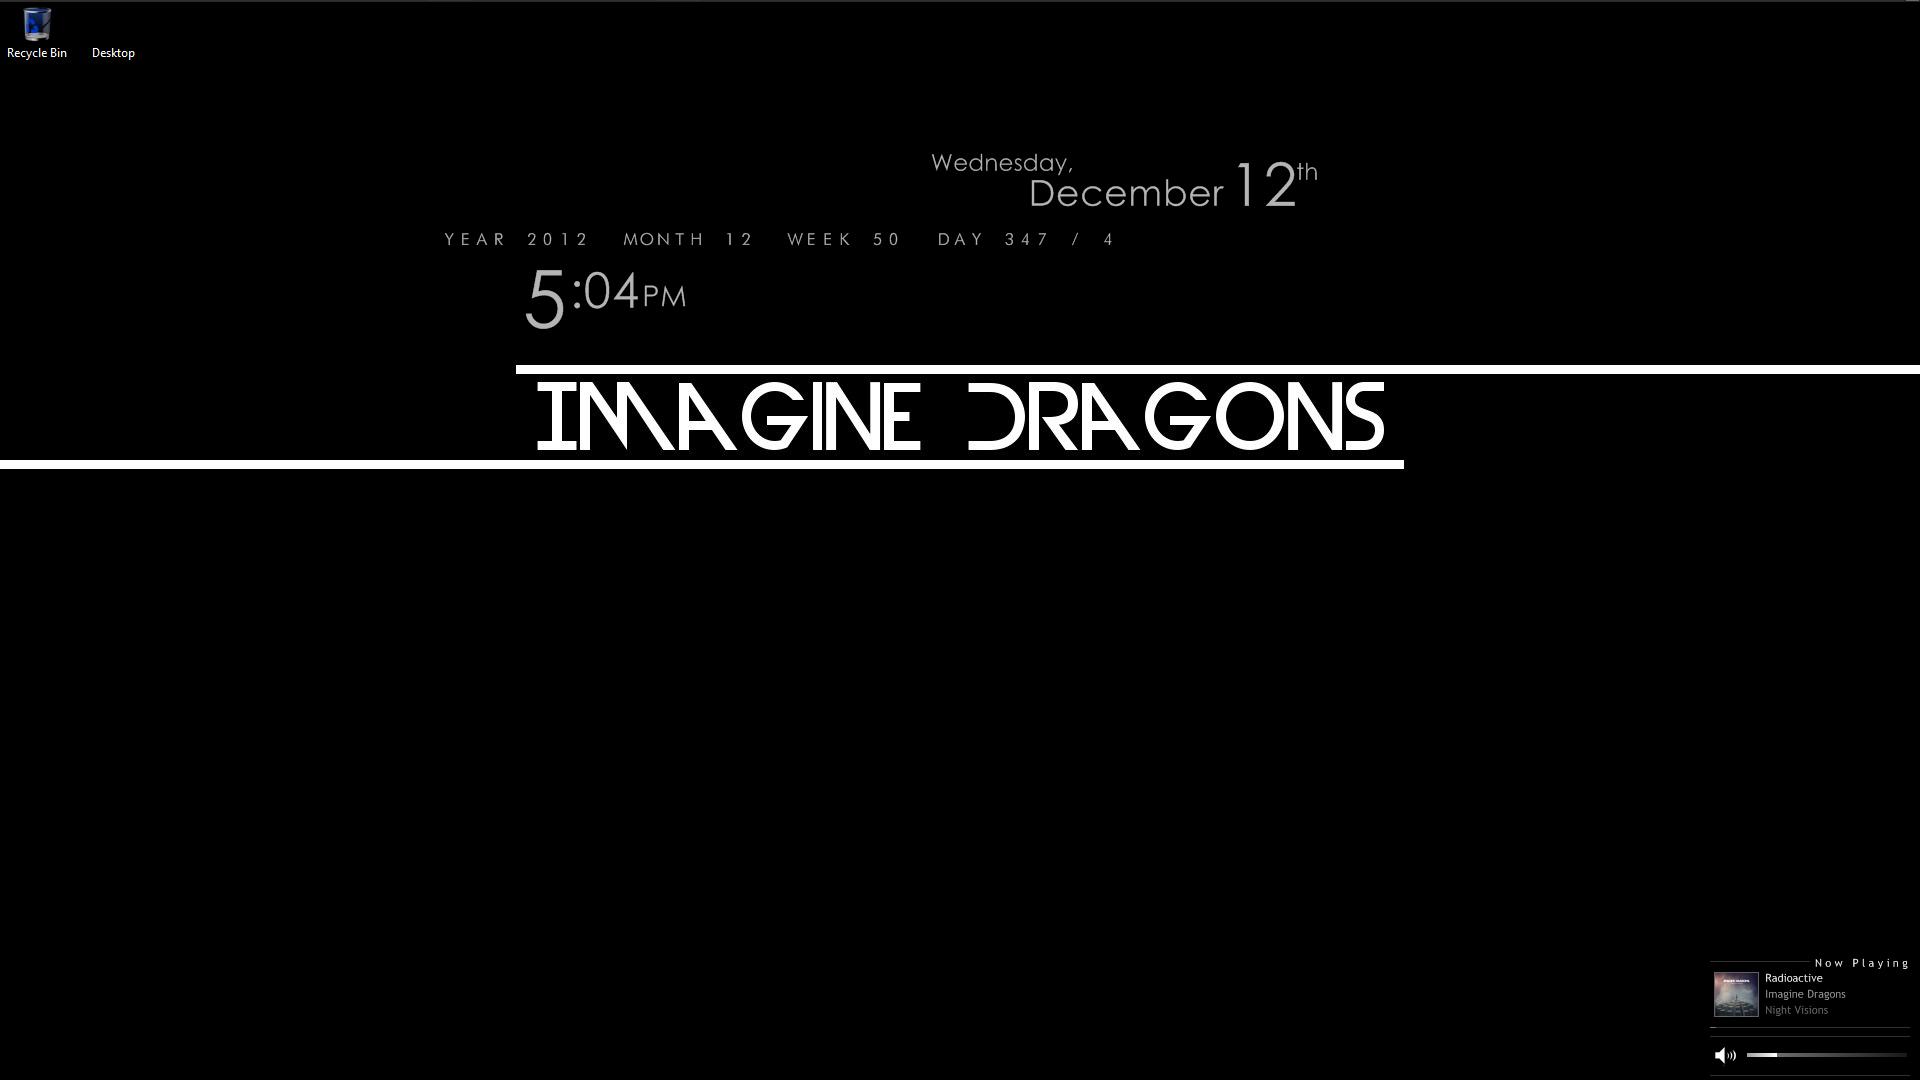 Imagine Dragons By NiinjaStyle 1920x1080